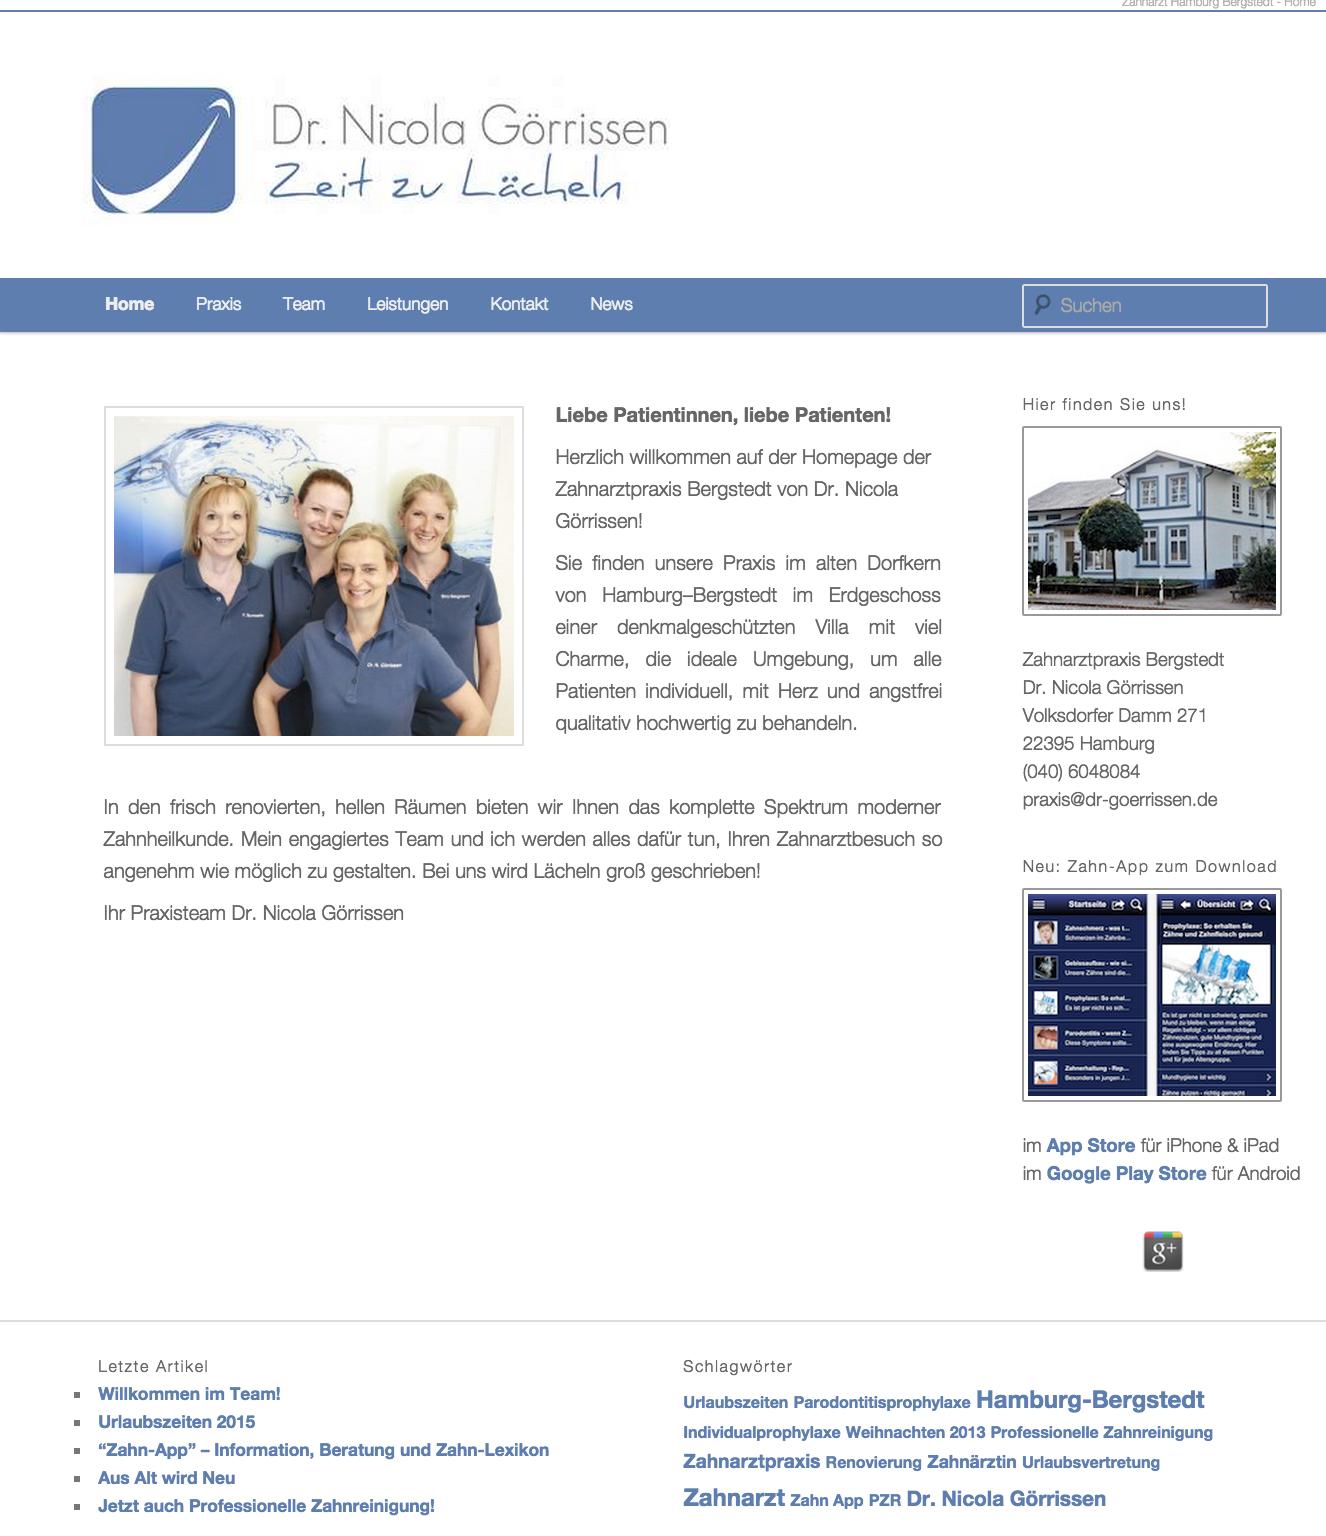 zahnarzt_bergstedt_goerrissen_webseite